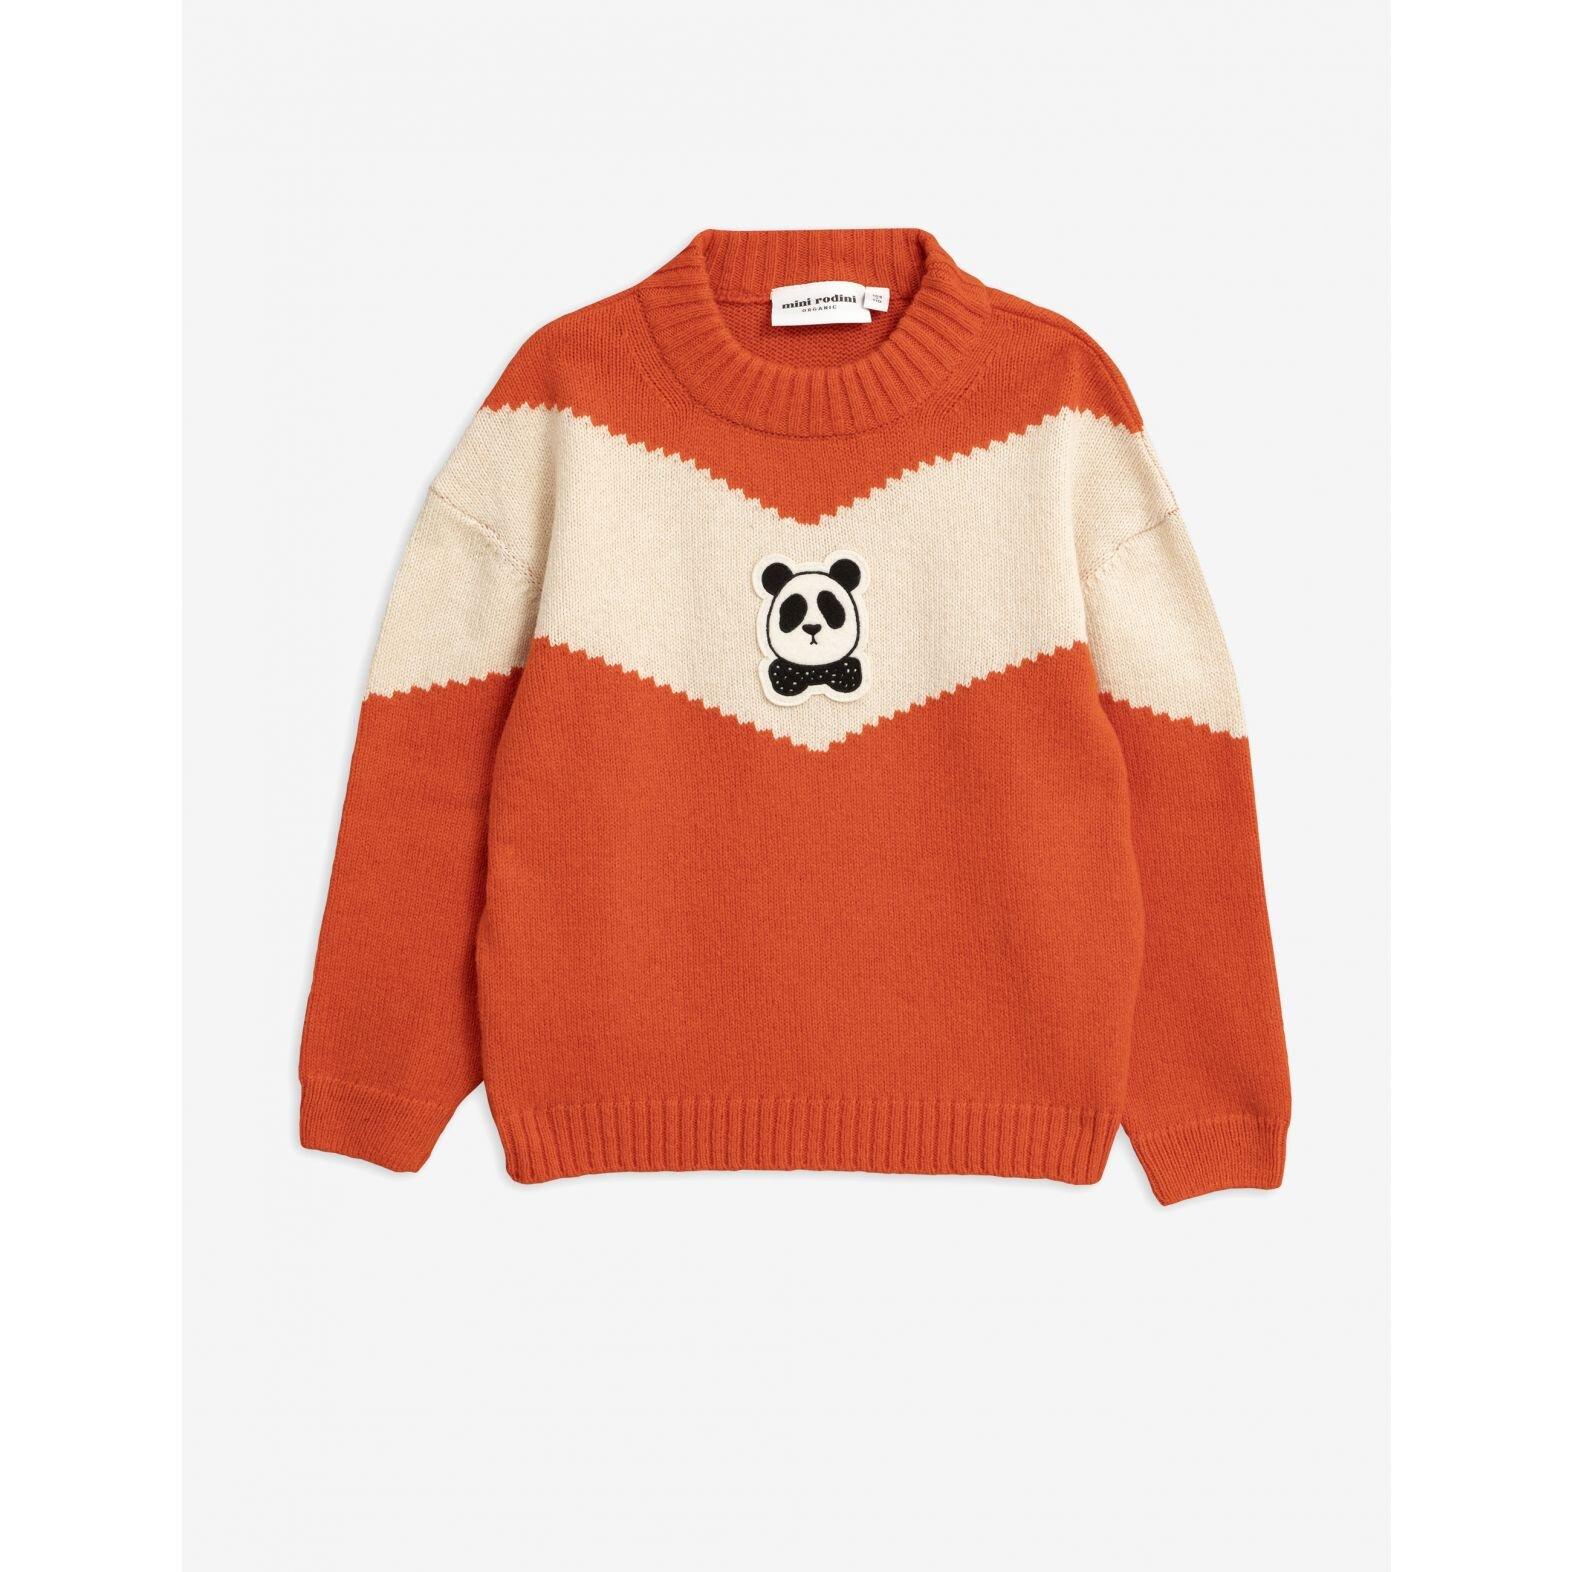 minirodinipandasweater.jpg